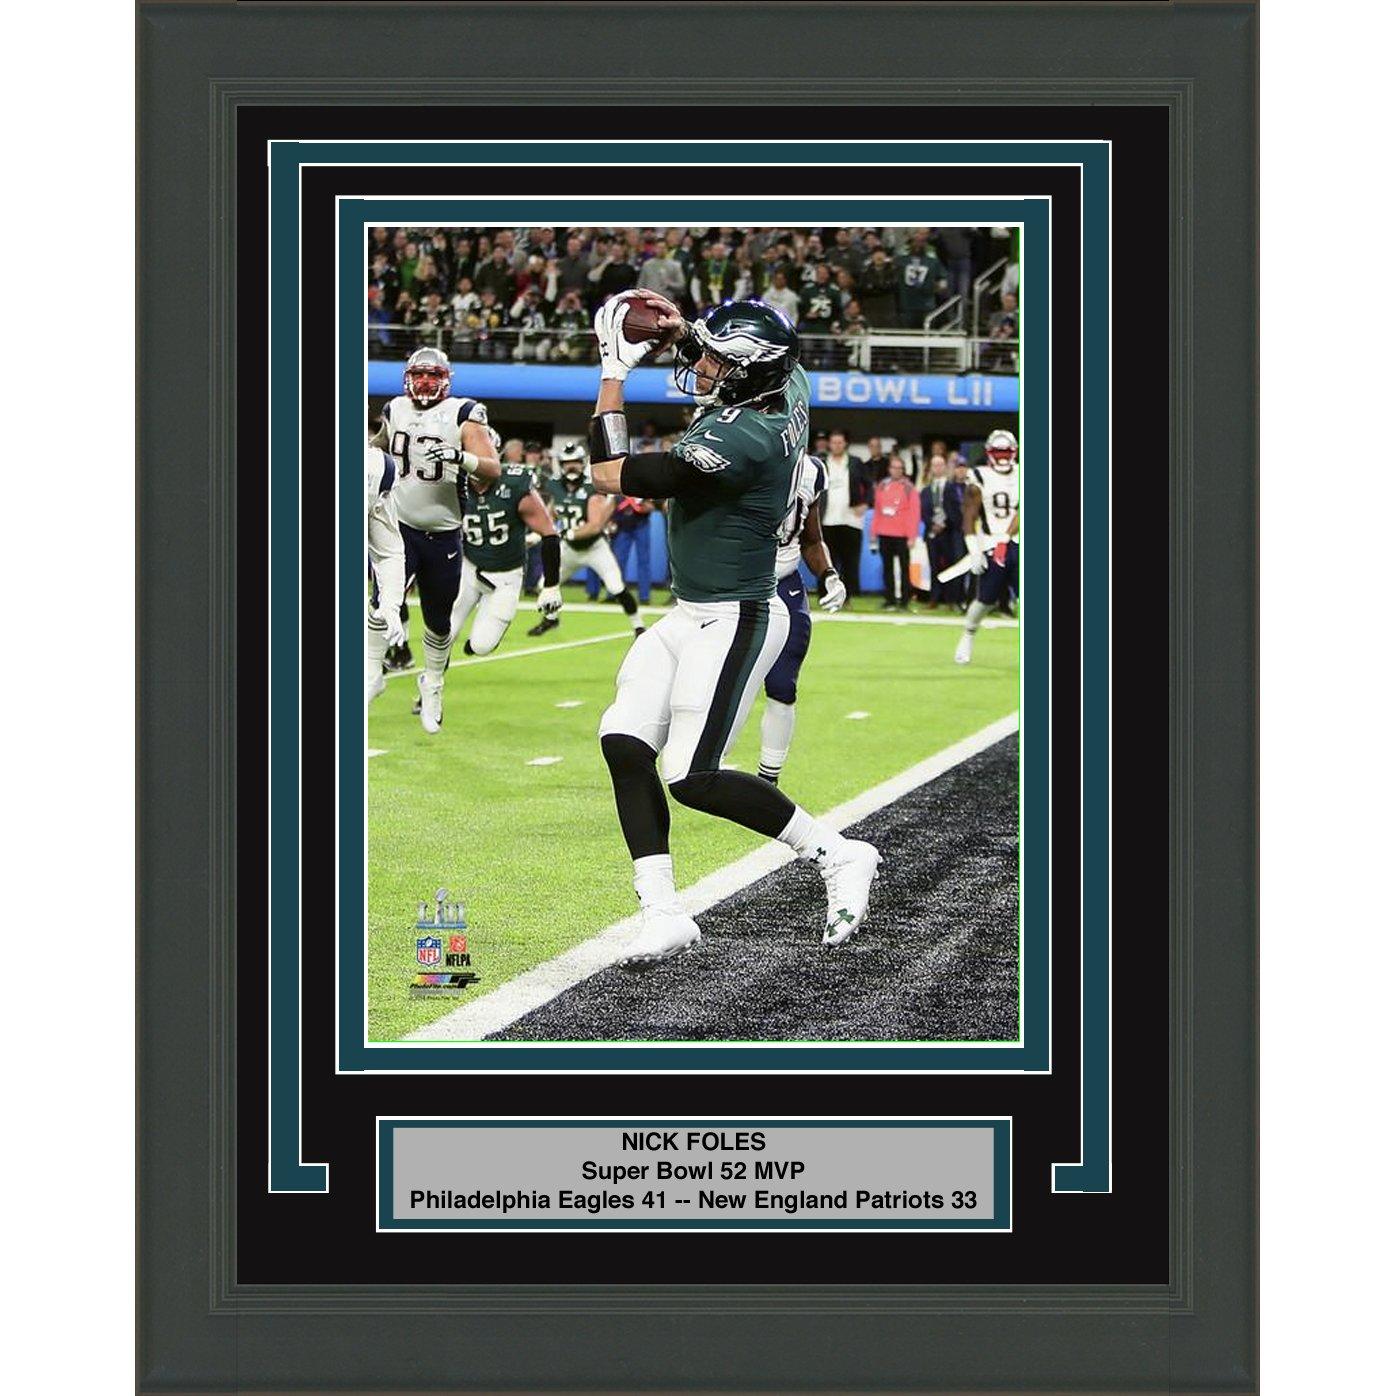 low priced 4a7c3 f1c92 Amazon.com: Framed Nick Foles Philadelphia Eagles Super Bowl ...